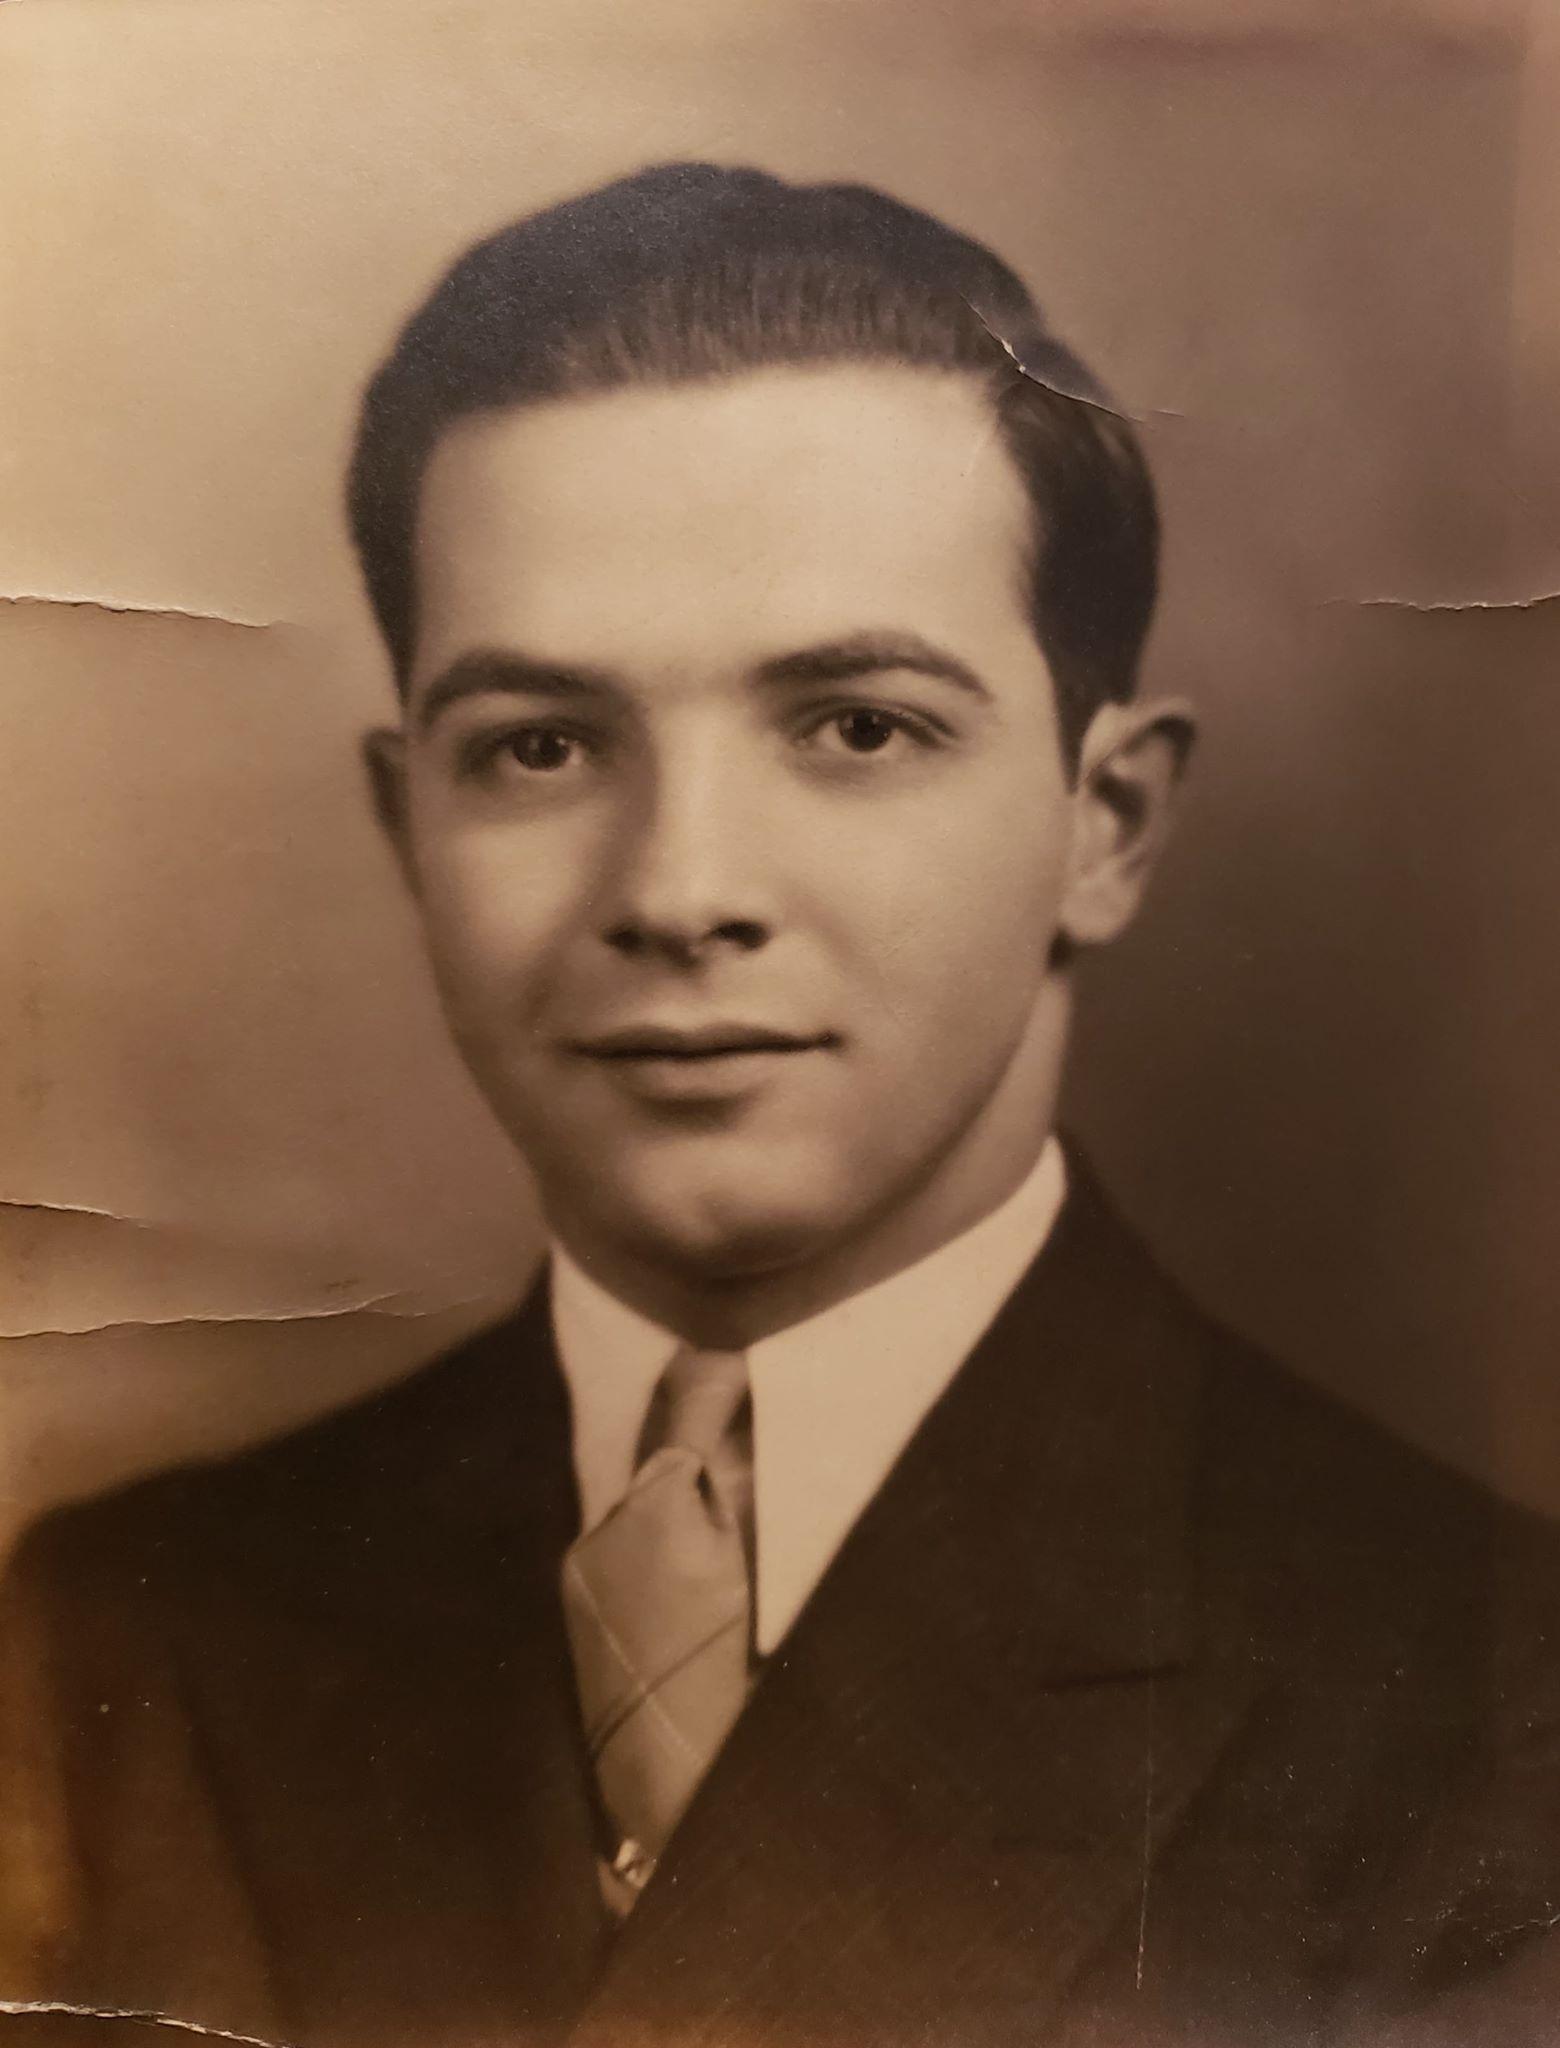 Stephen Karr (1919-2007)